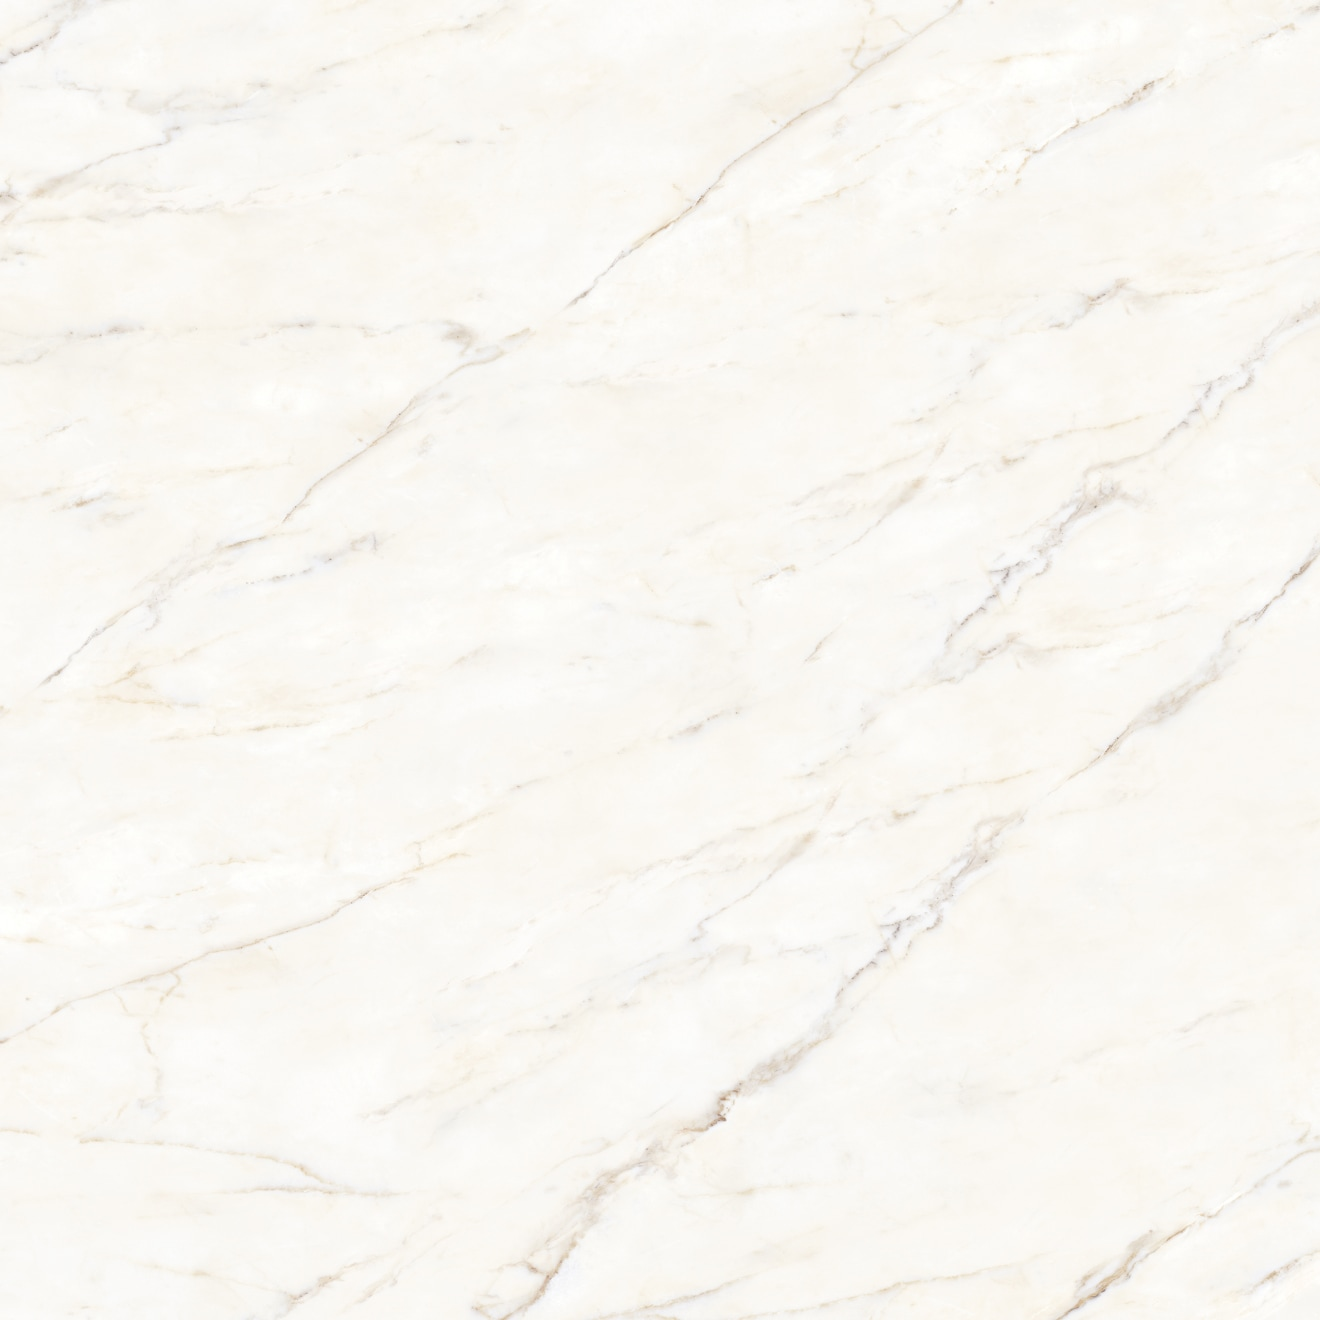 Magnifica 30 X 30 Floor Wall Tile In Calacatta Oro Bedrosians Tile Stone